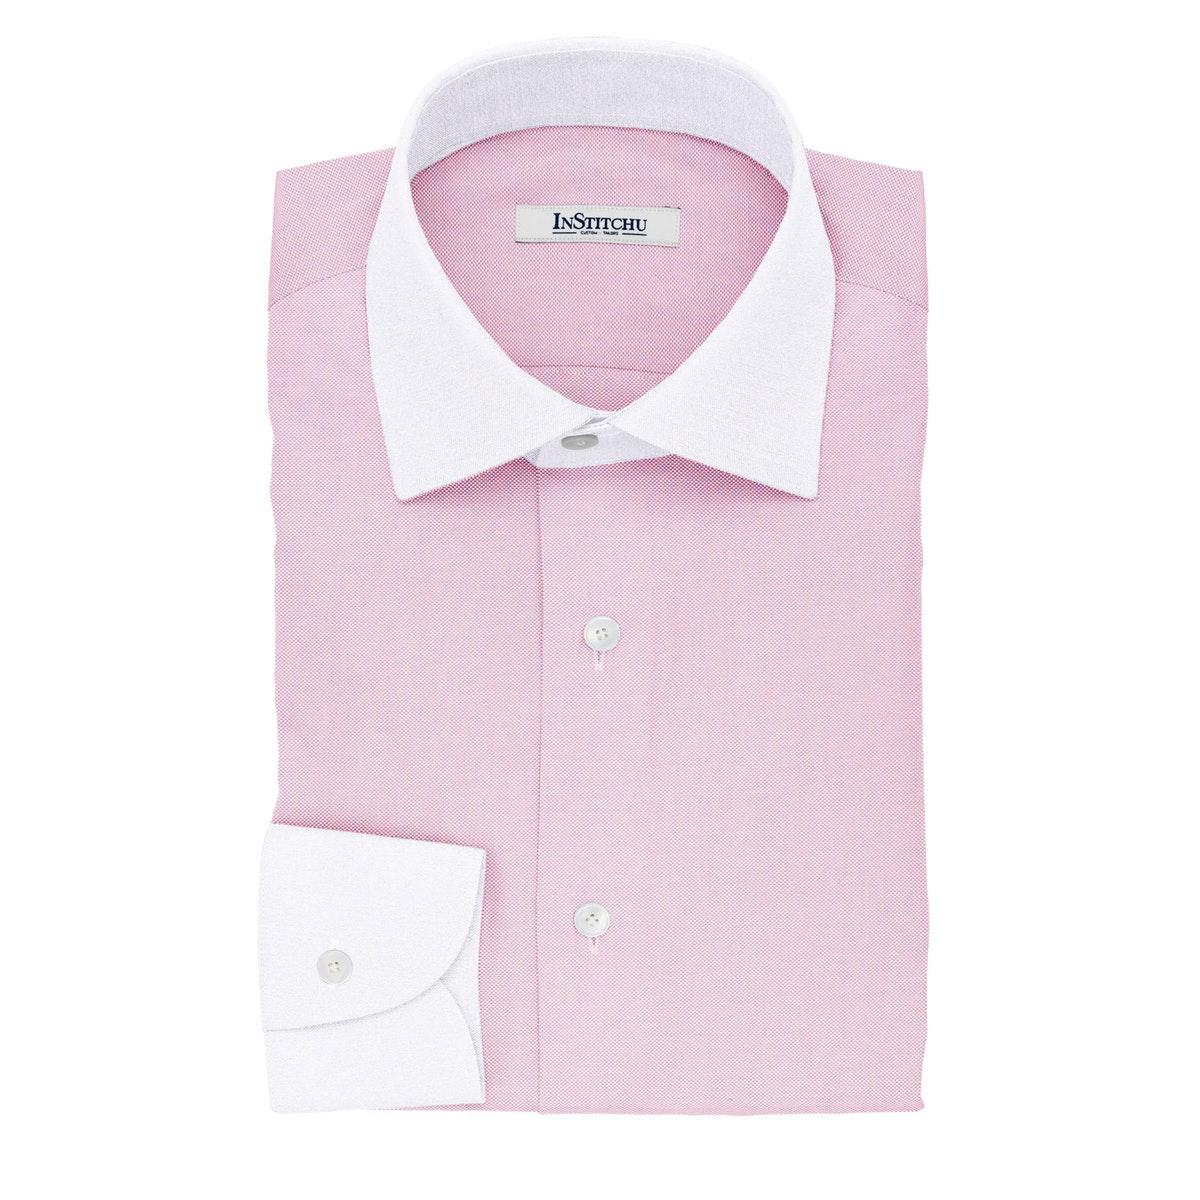 InStitchu Collection The Wildman Textured Cotton Banker Shirt